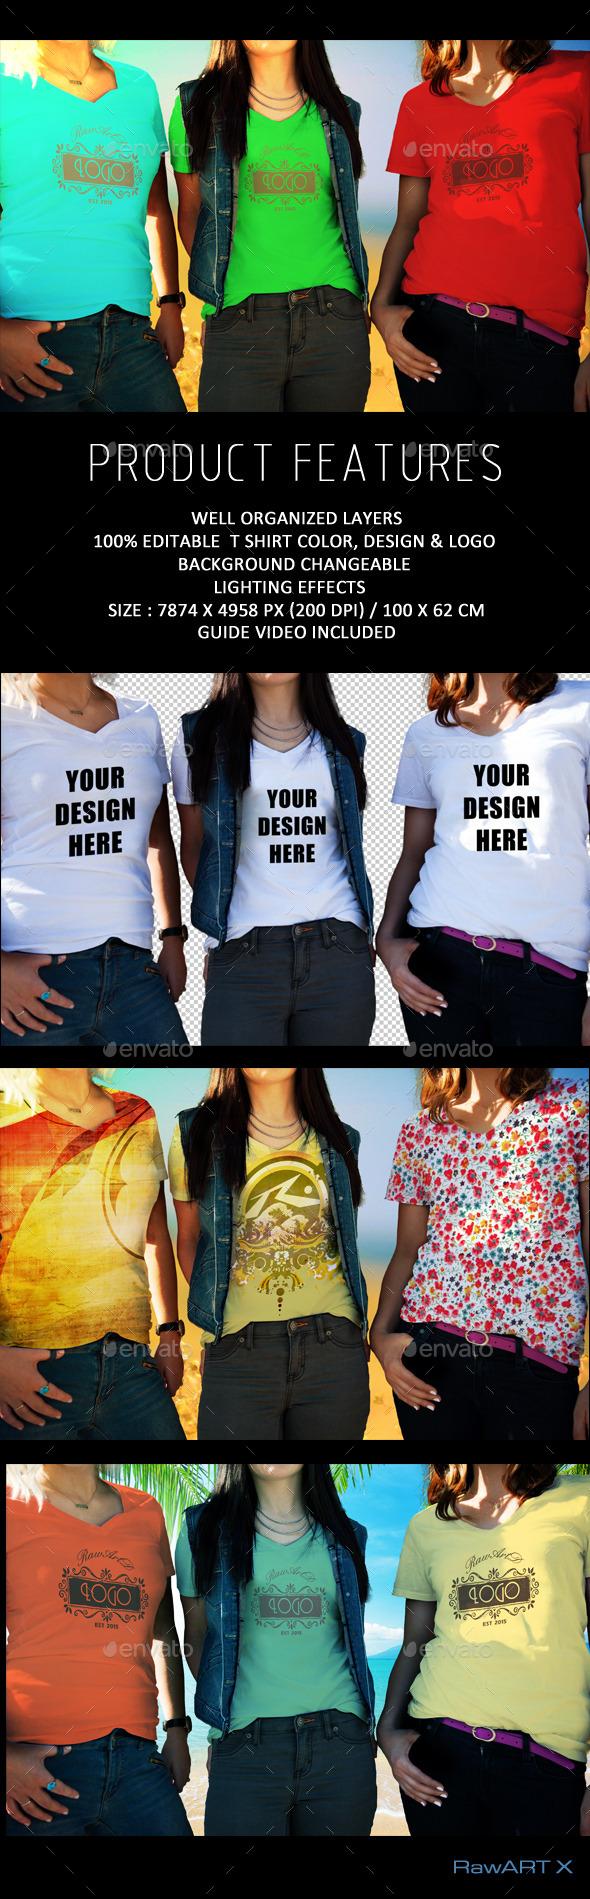 T shirt Mock-up